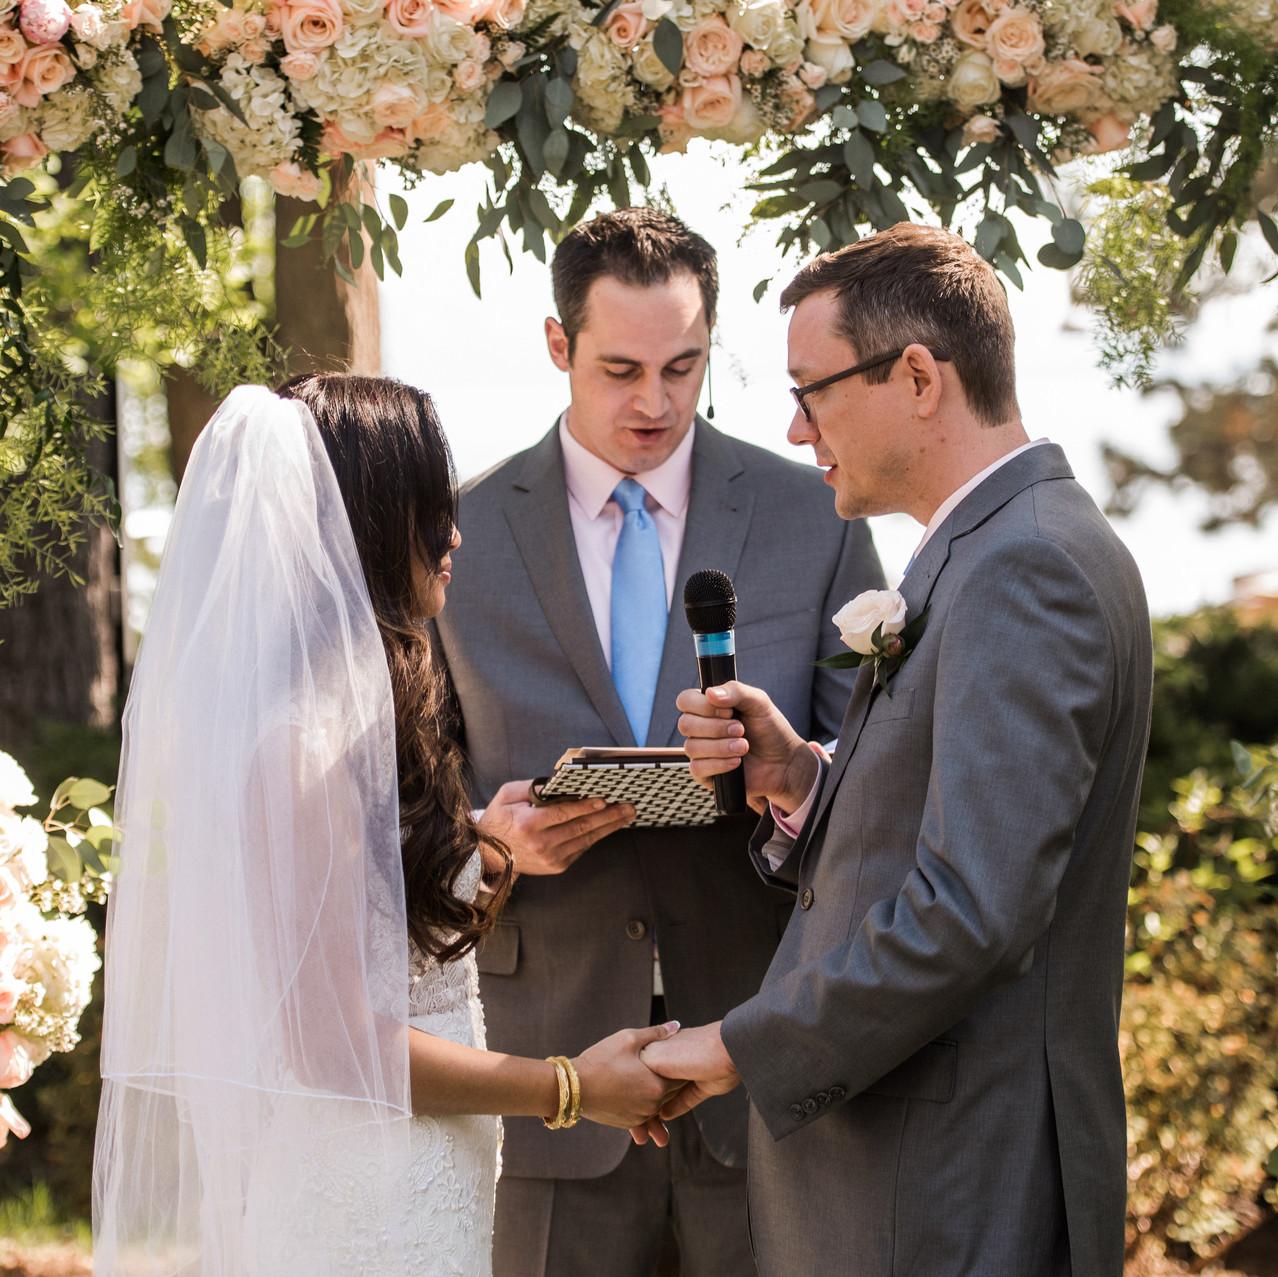 A-Floral-Affair-HYATT-LAKE-TAHOE-WEDDING-FLORIST (10)